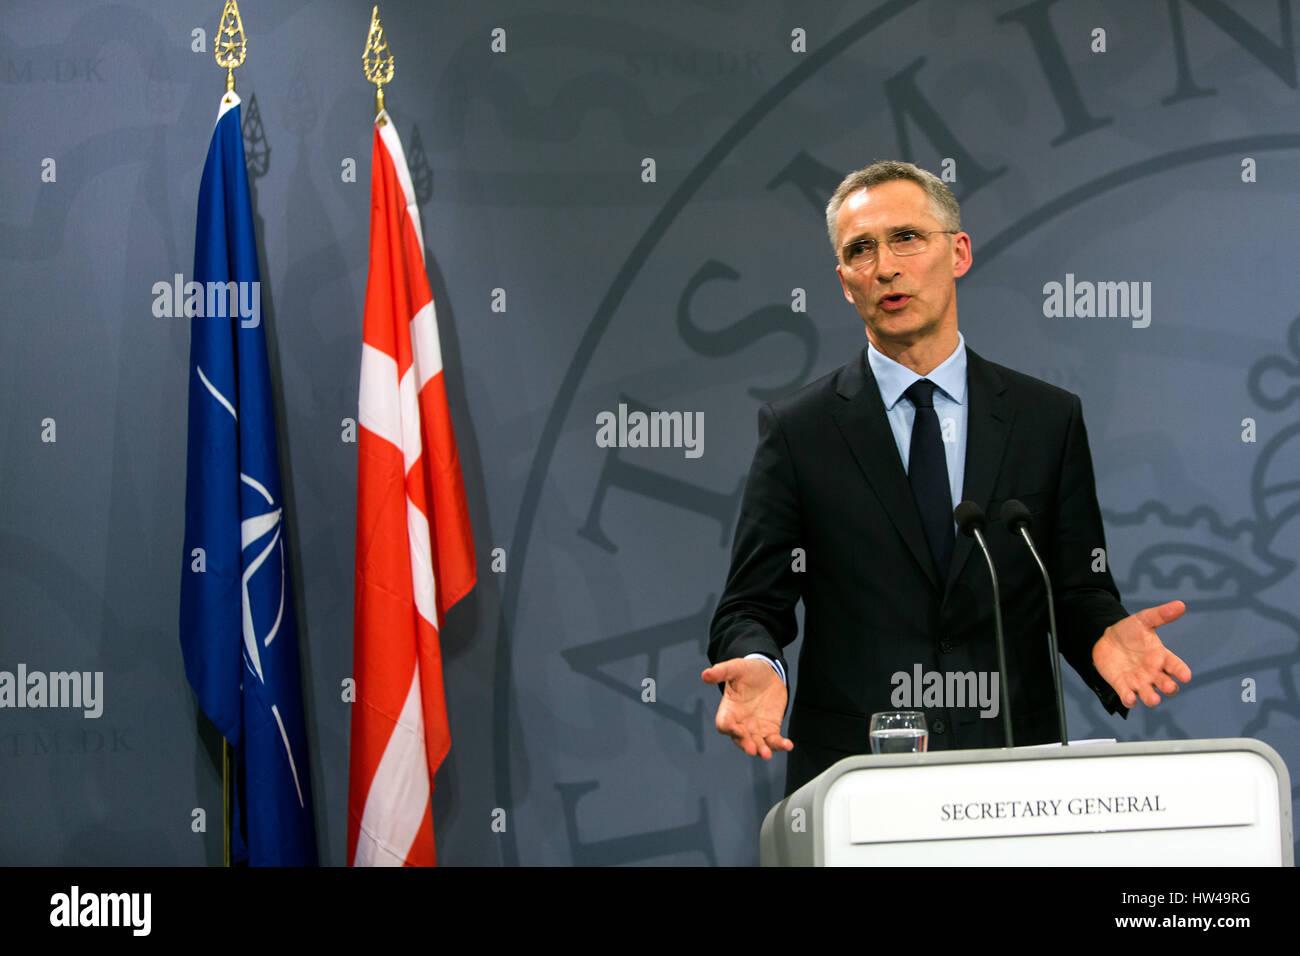 NATO Secretary General Jens Stoltenberg speaks at a press conference with Danish Prime Minister Lars Lokke Rasmussen - Stock Image